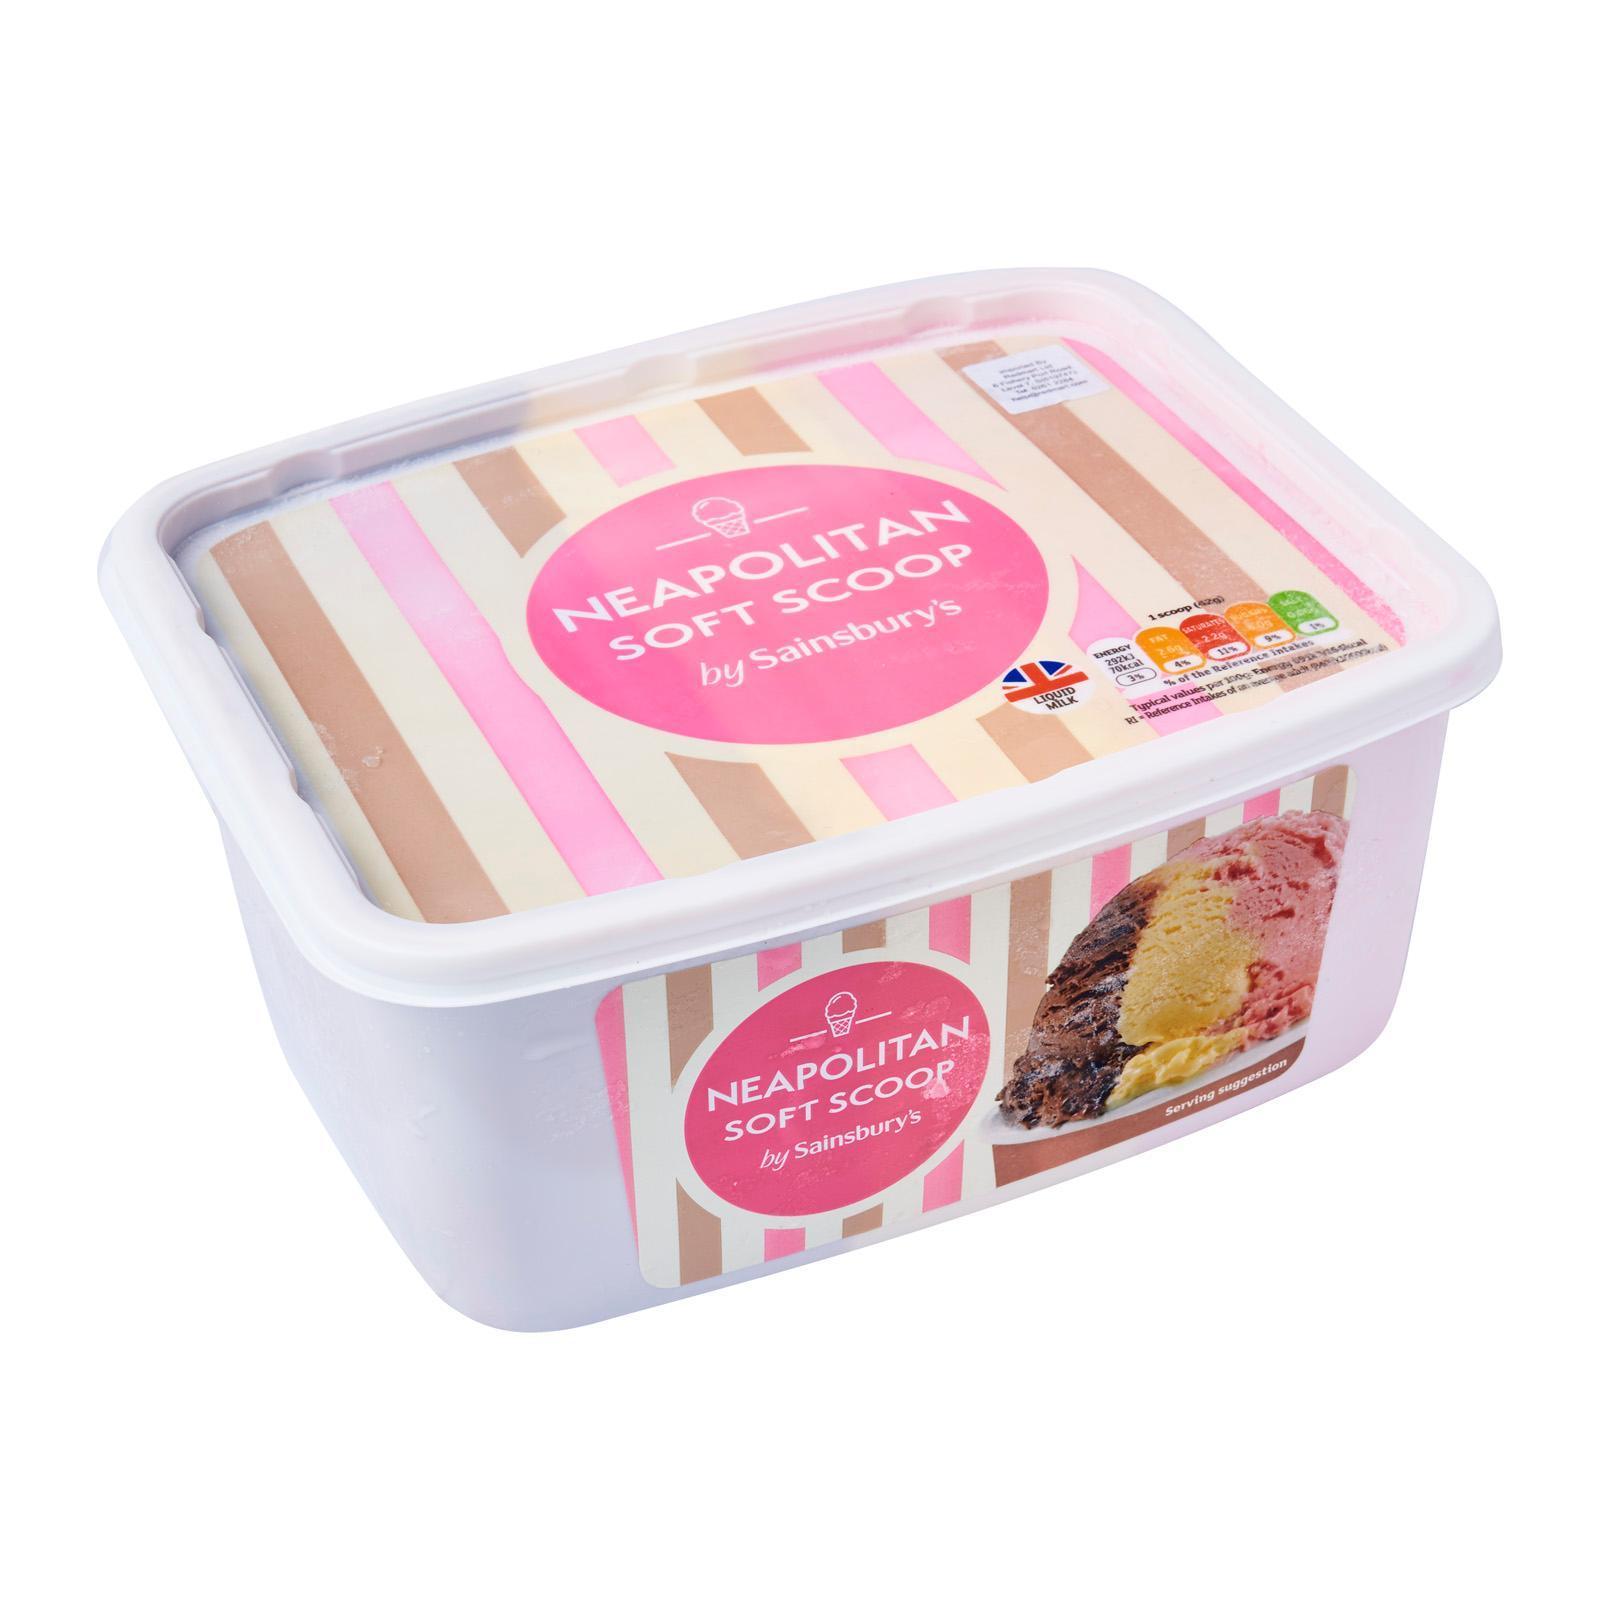 Sainsbury's Neapolitan Soft Scoop Ice Cream - Frozen